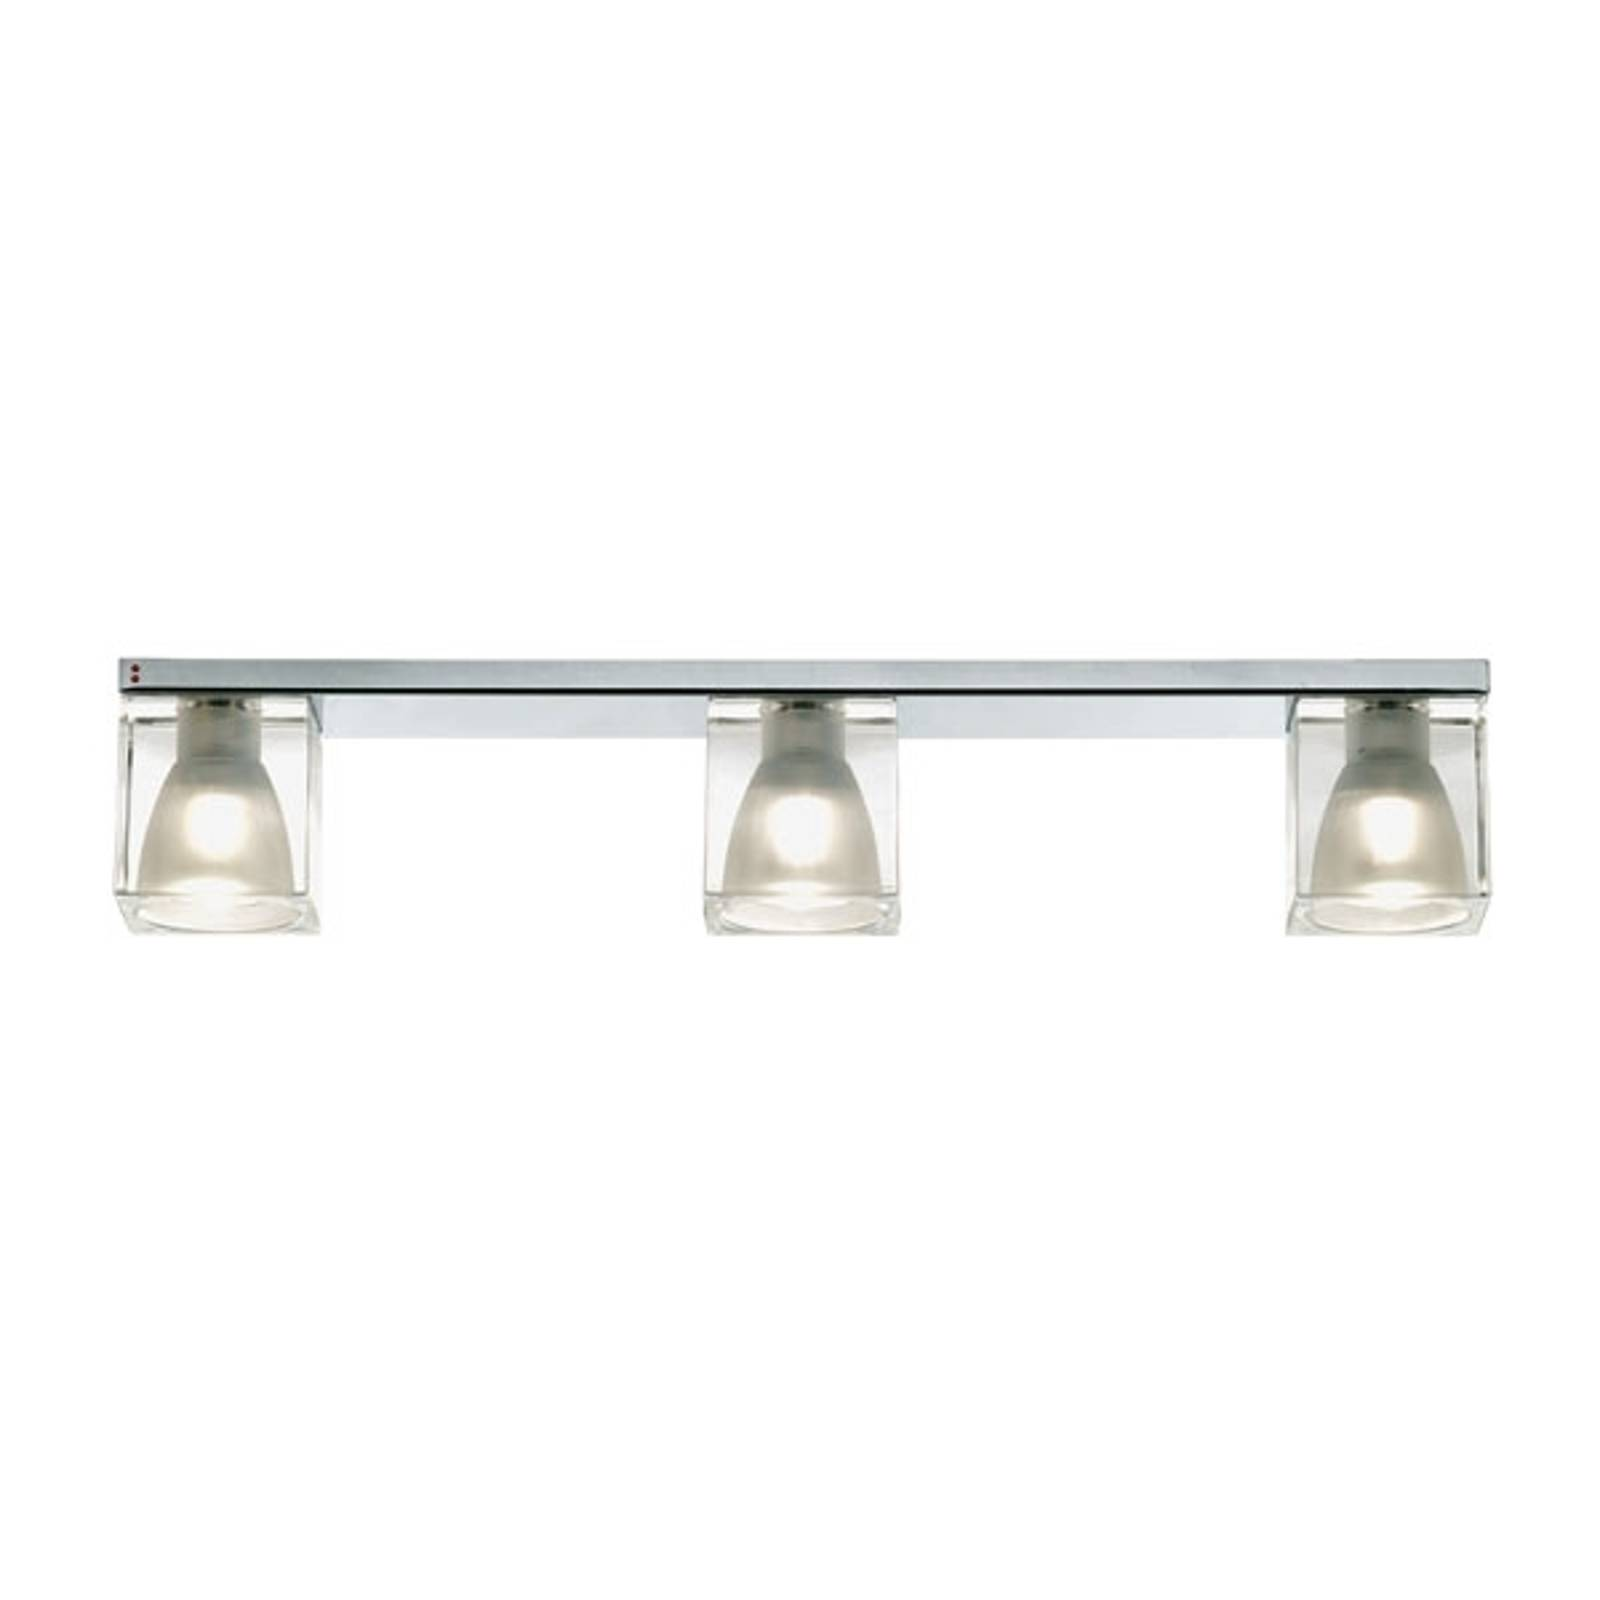 Exclusieve 3-lichts Plafondlamp CUBETTO